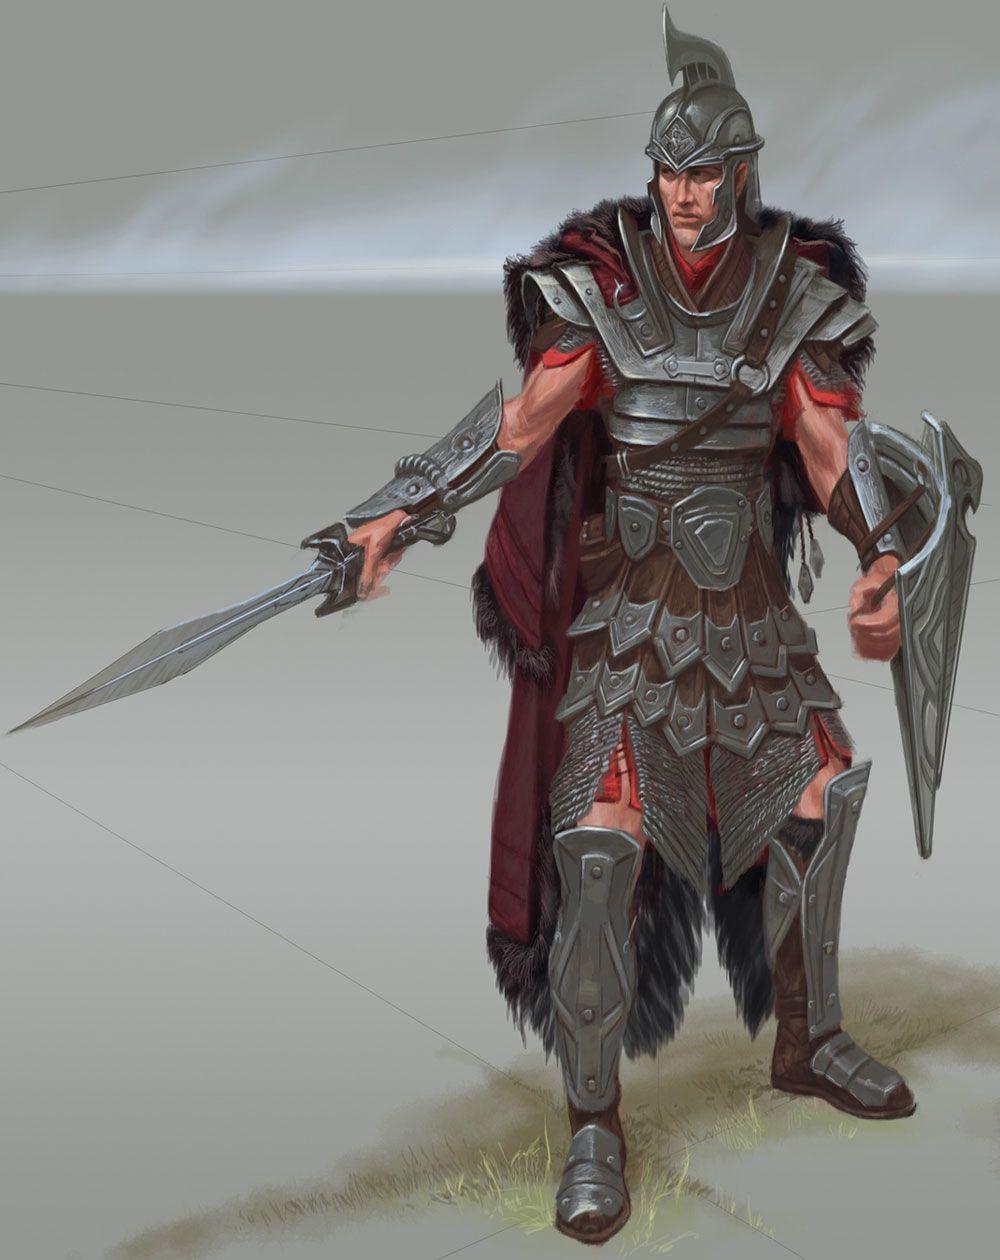 Imperial Legion Oblivion The Elder Scrolls V: S...